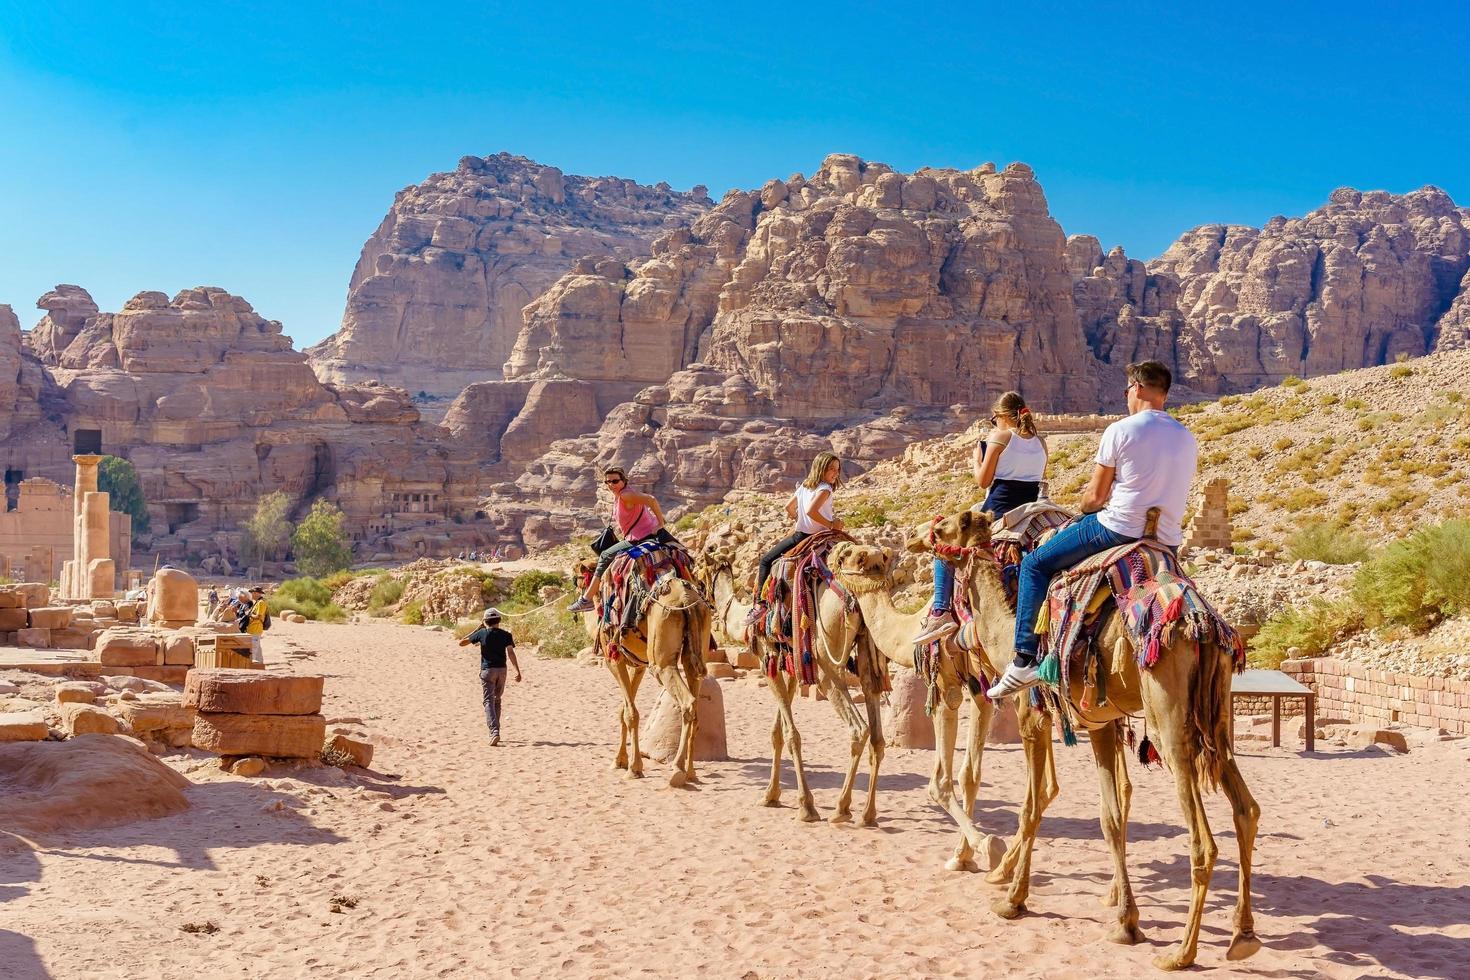 I turisti a cavallo di cammelli a petra, giordania, 2018 foto